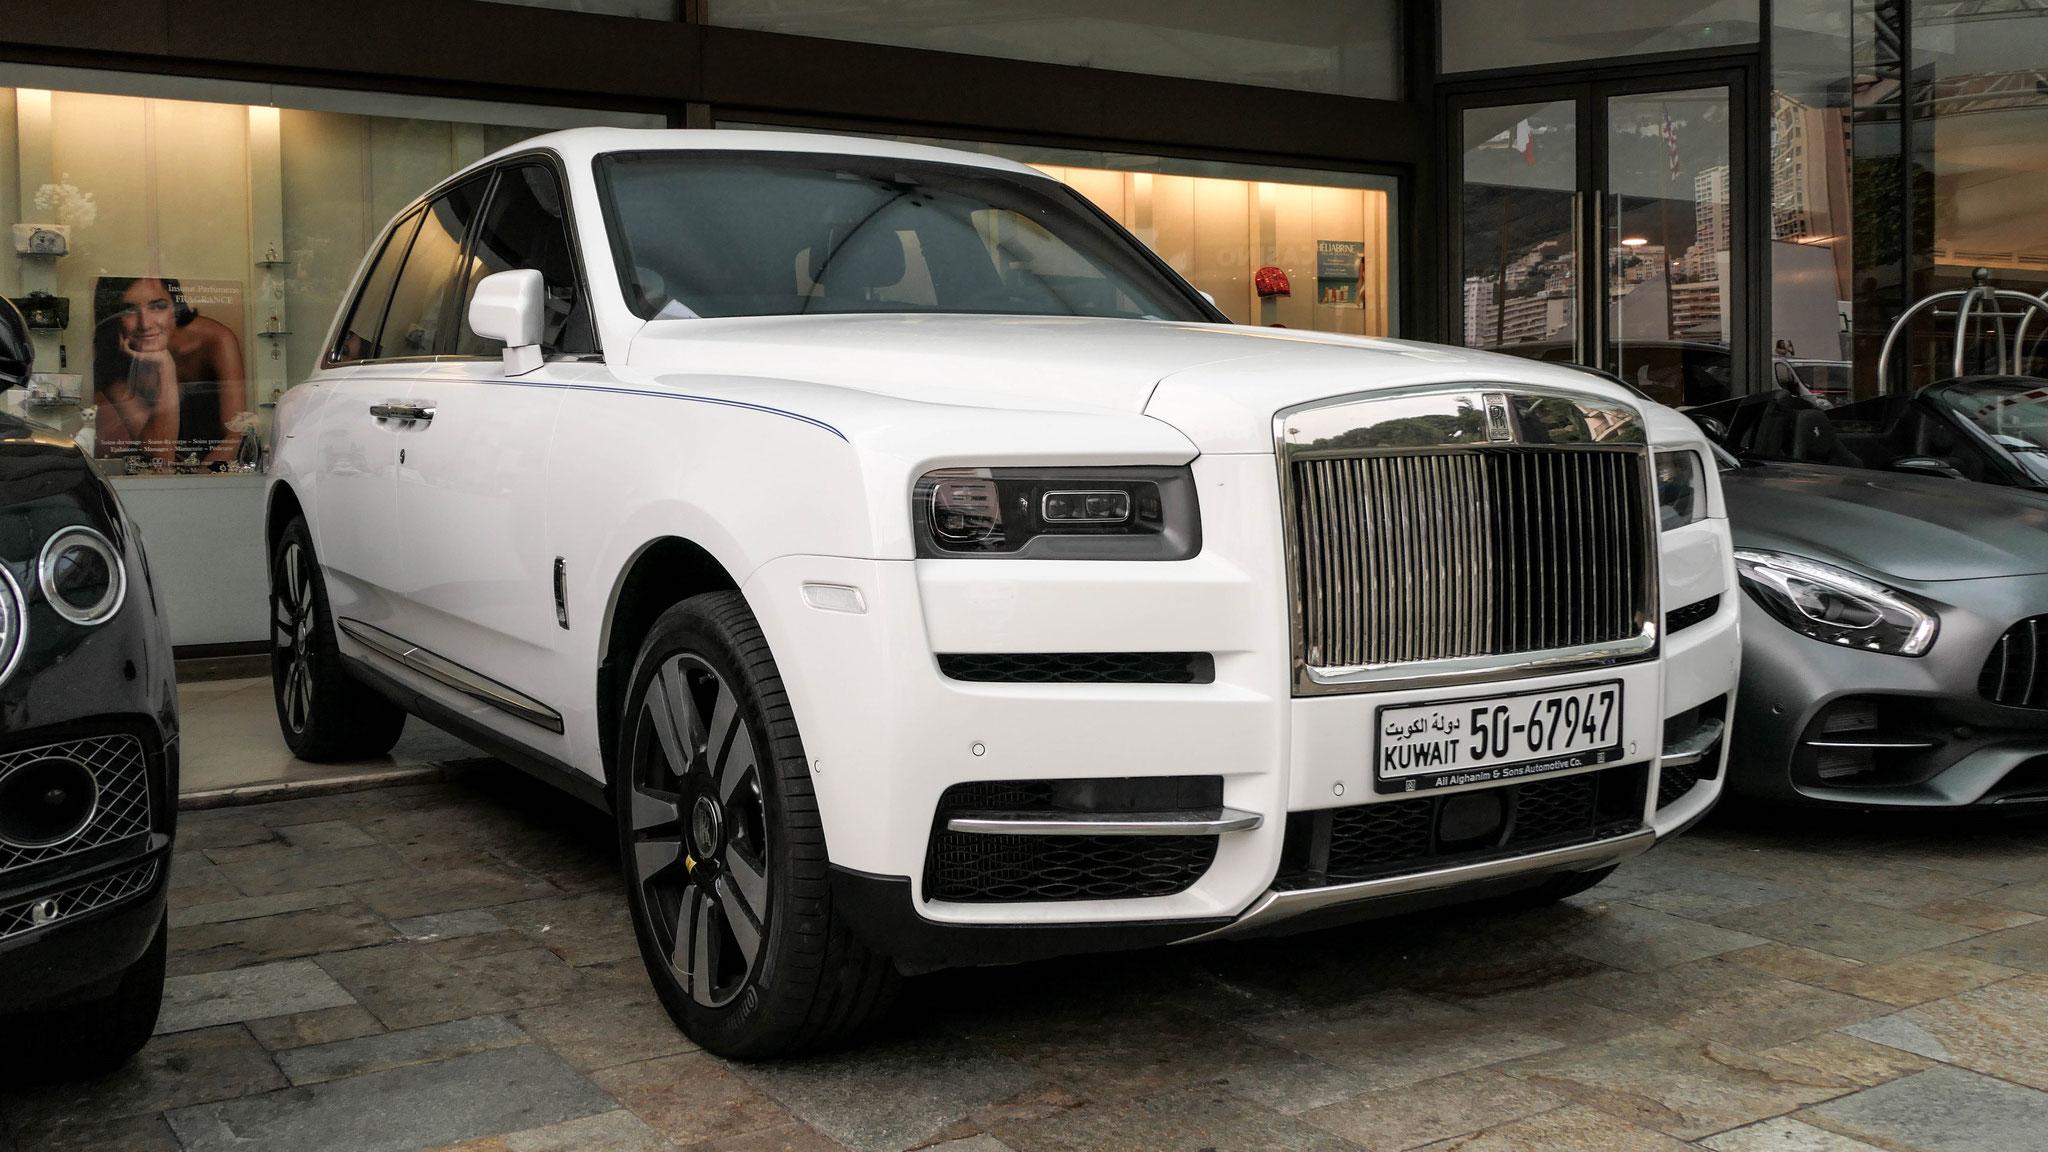 Rolls Royce Cullinan - 50-67947 (KWT)